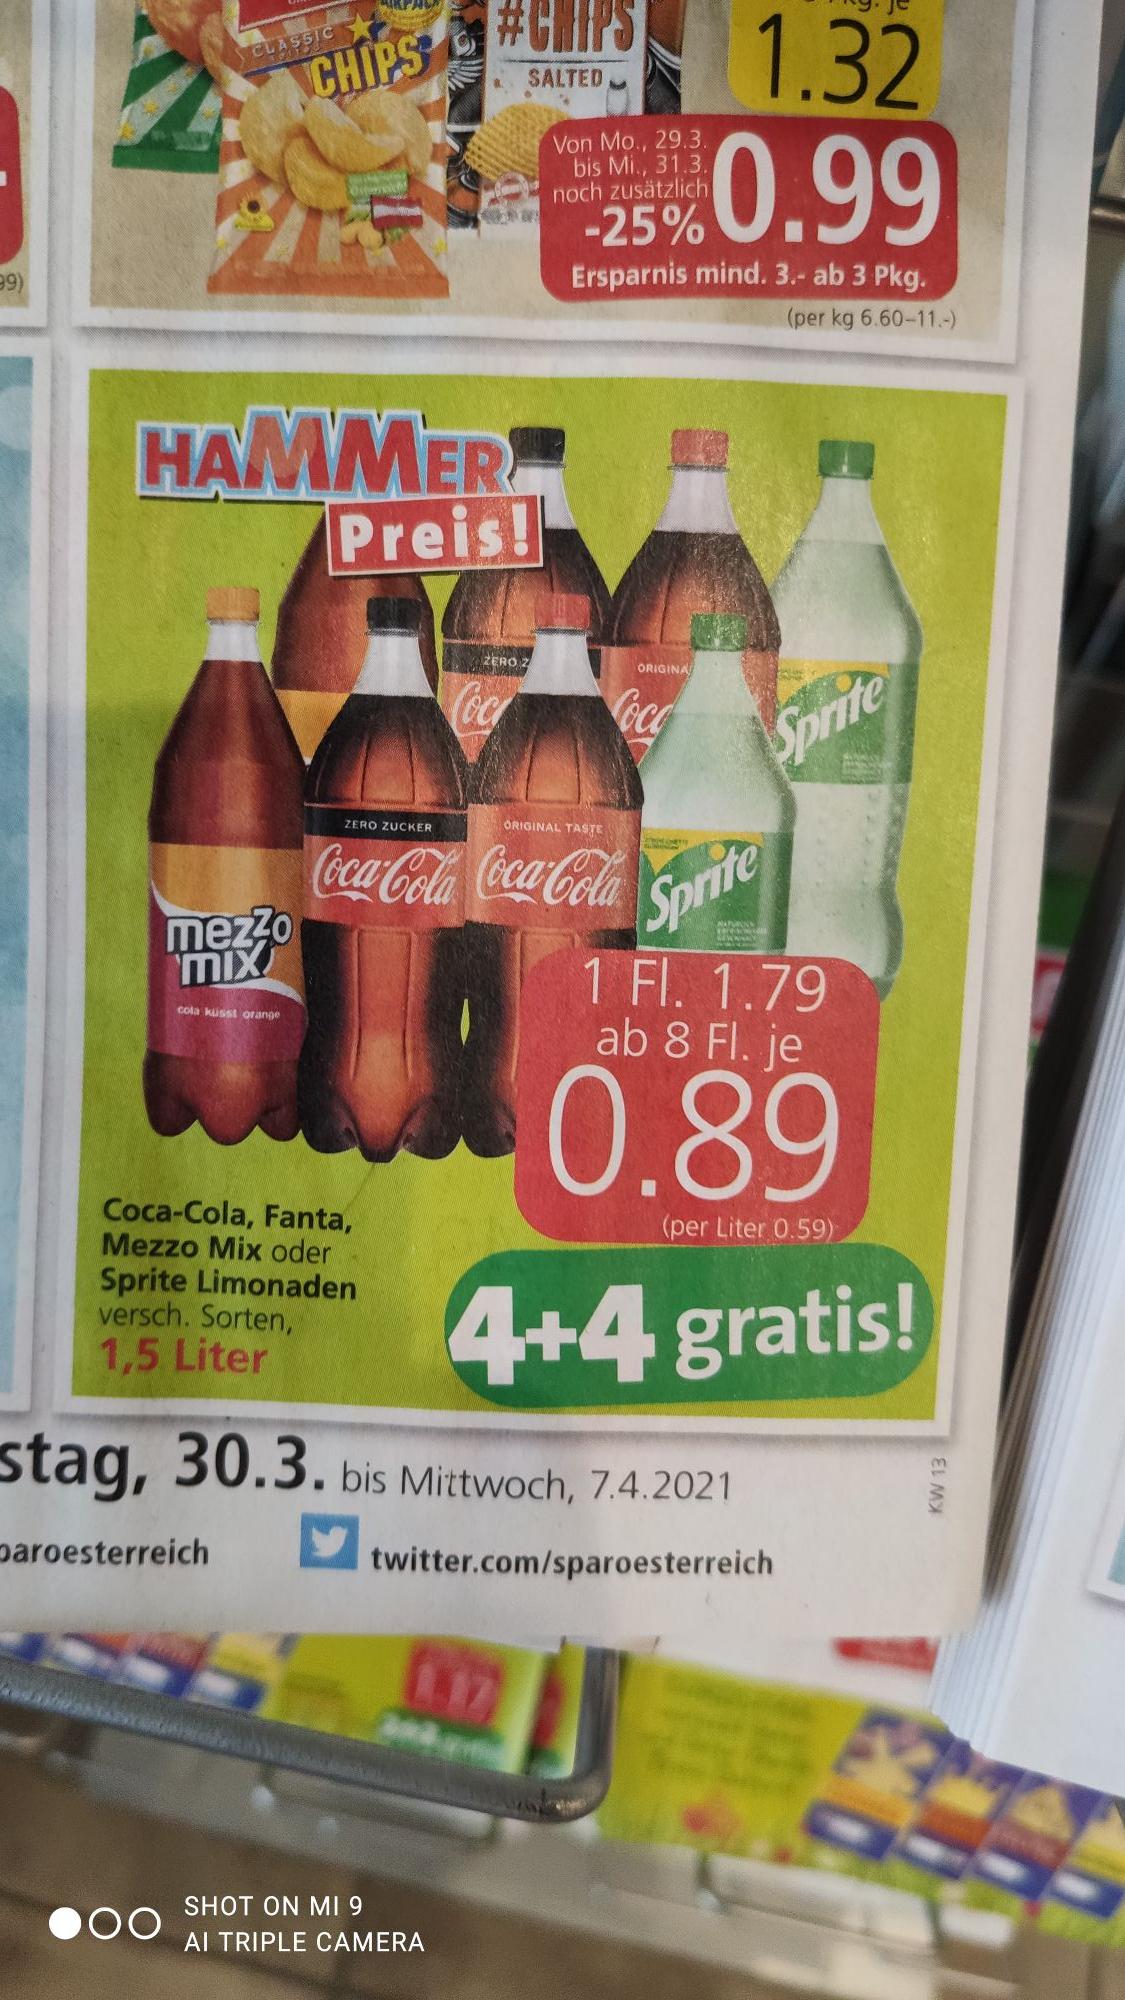 Interspar Coca-Cola, Coca-Cola Zero, Sprite, Fanta, Mezzomix 1,5L 4+4 Gratis Aktion